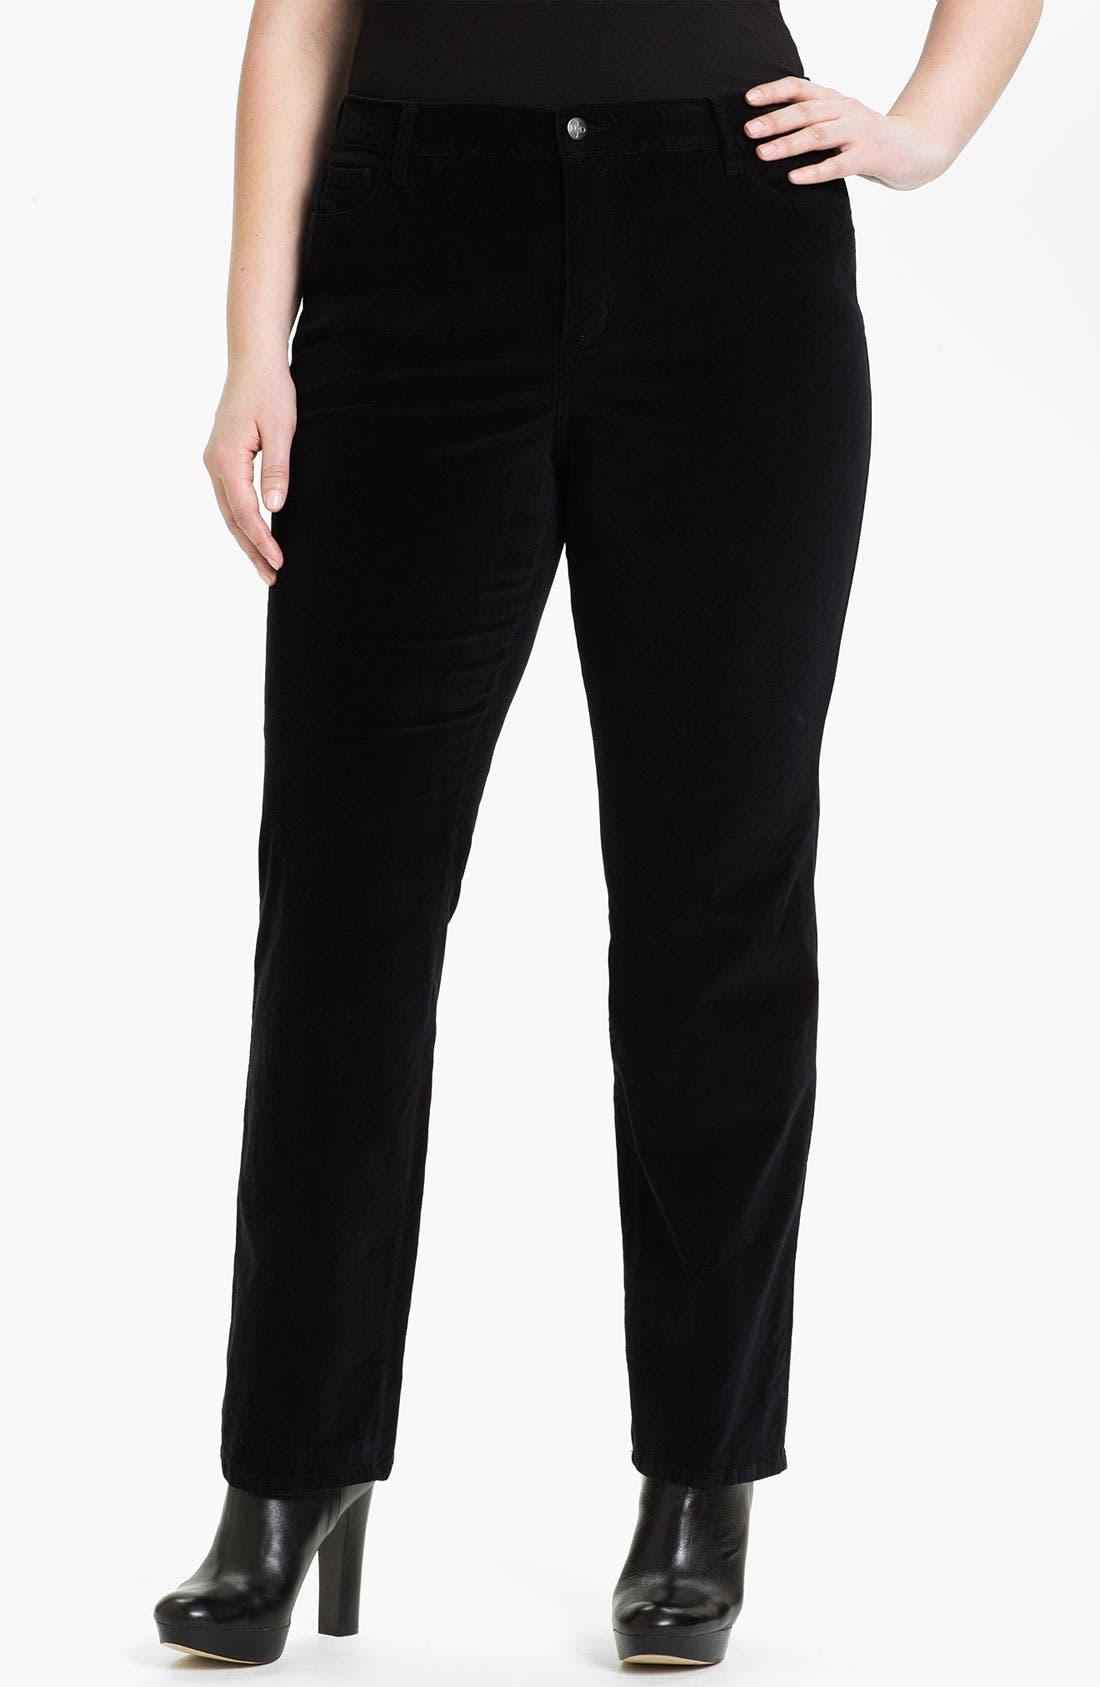 Alternate Image 1 Selected - NYDJ 'Sheri' Skinny Stretch Velveteen Jeans (Plus)